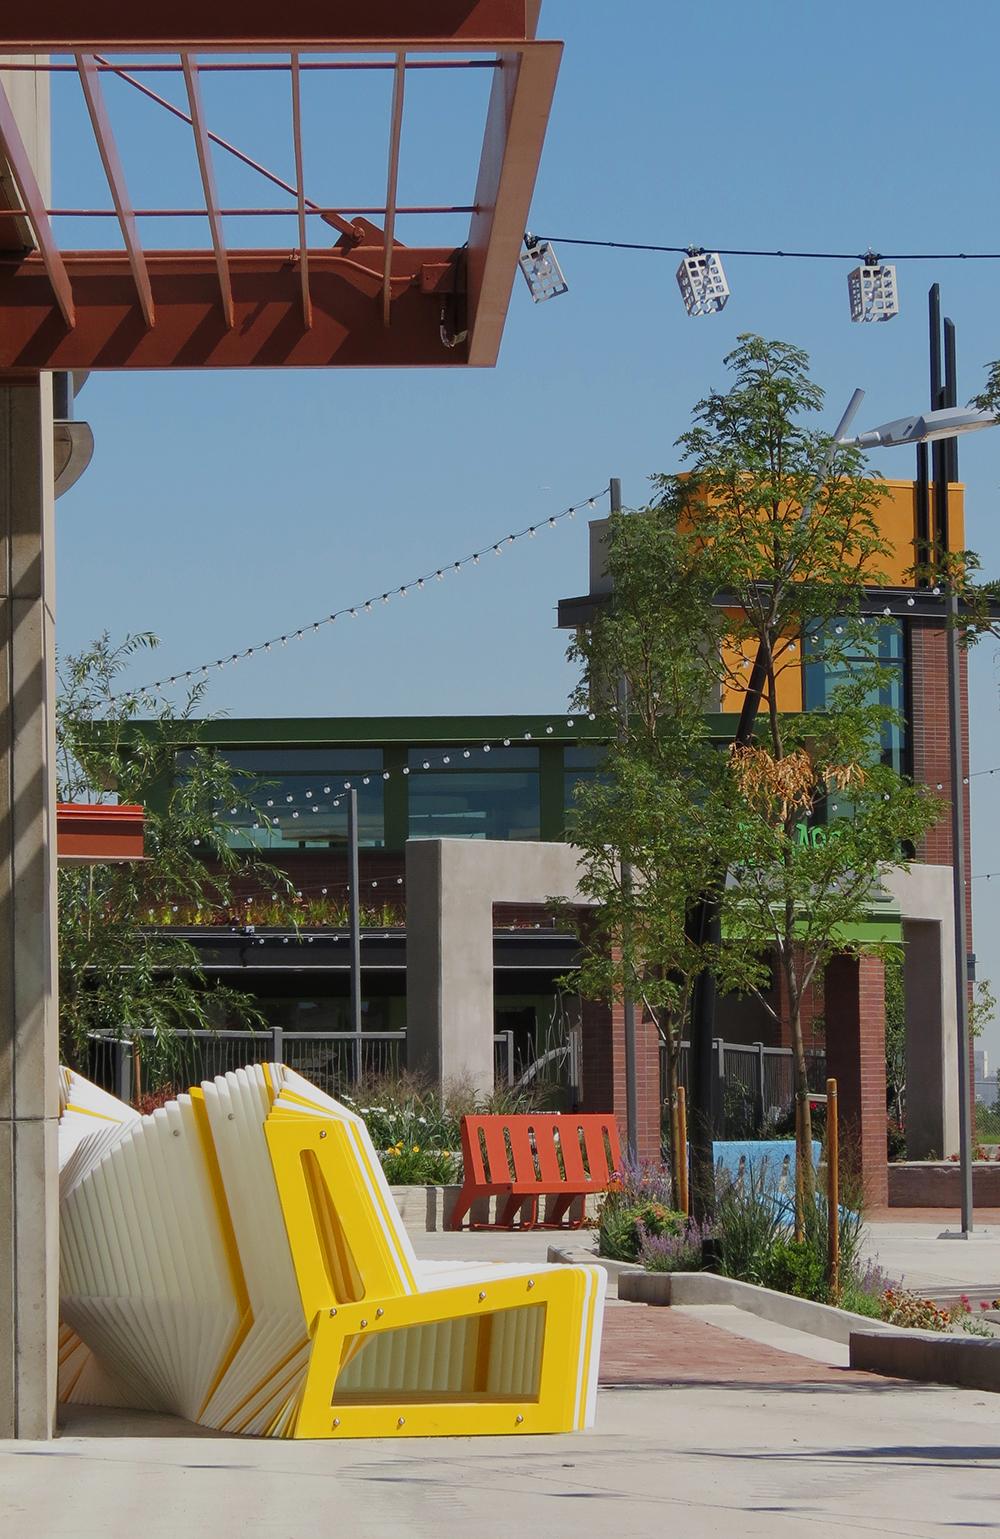 Midtown Artful Outdoor Furnishings